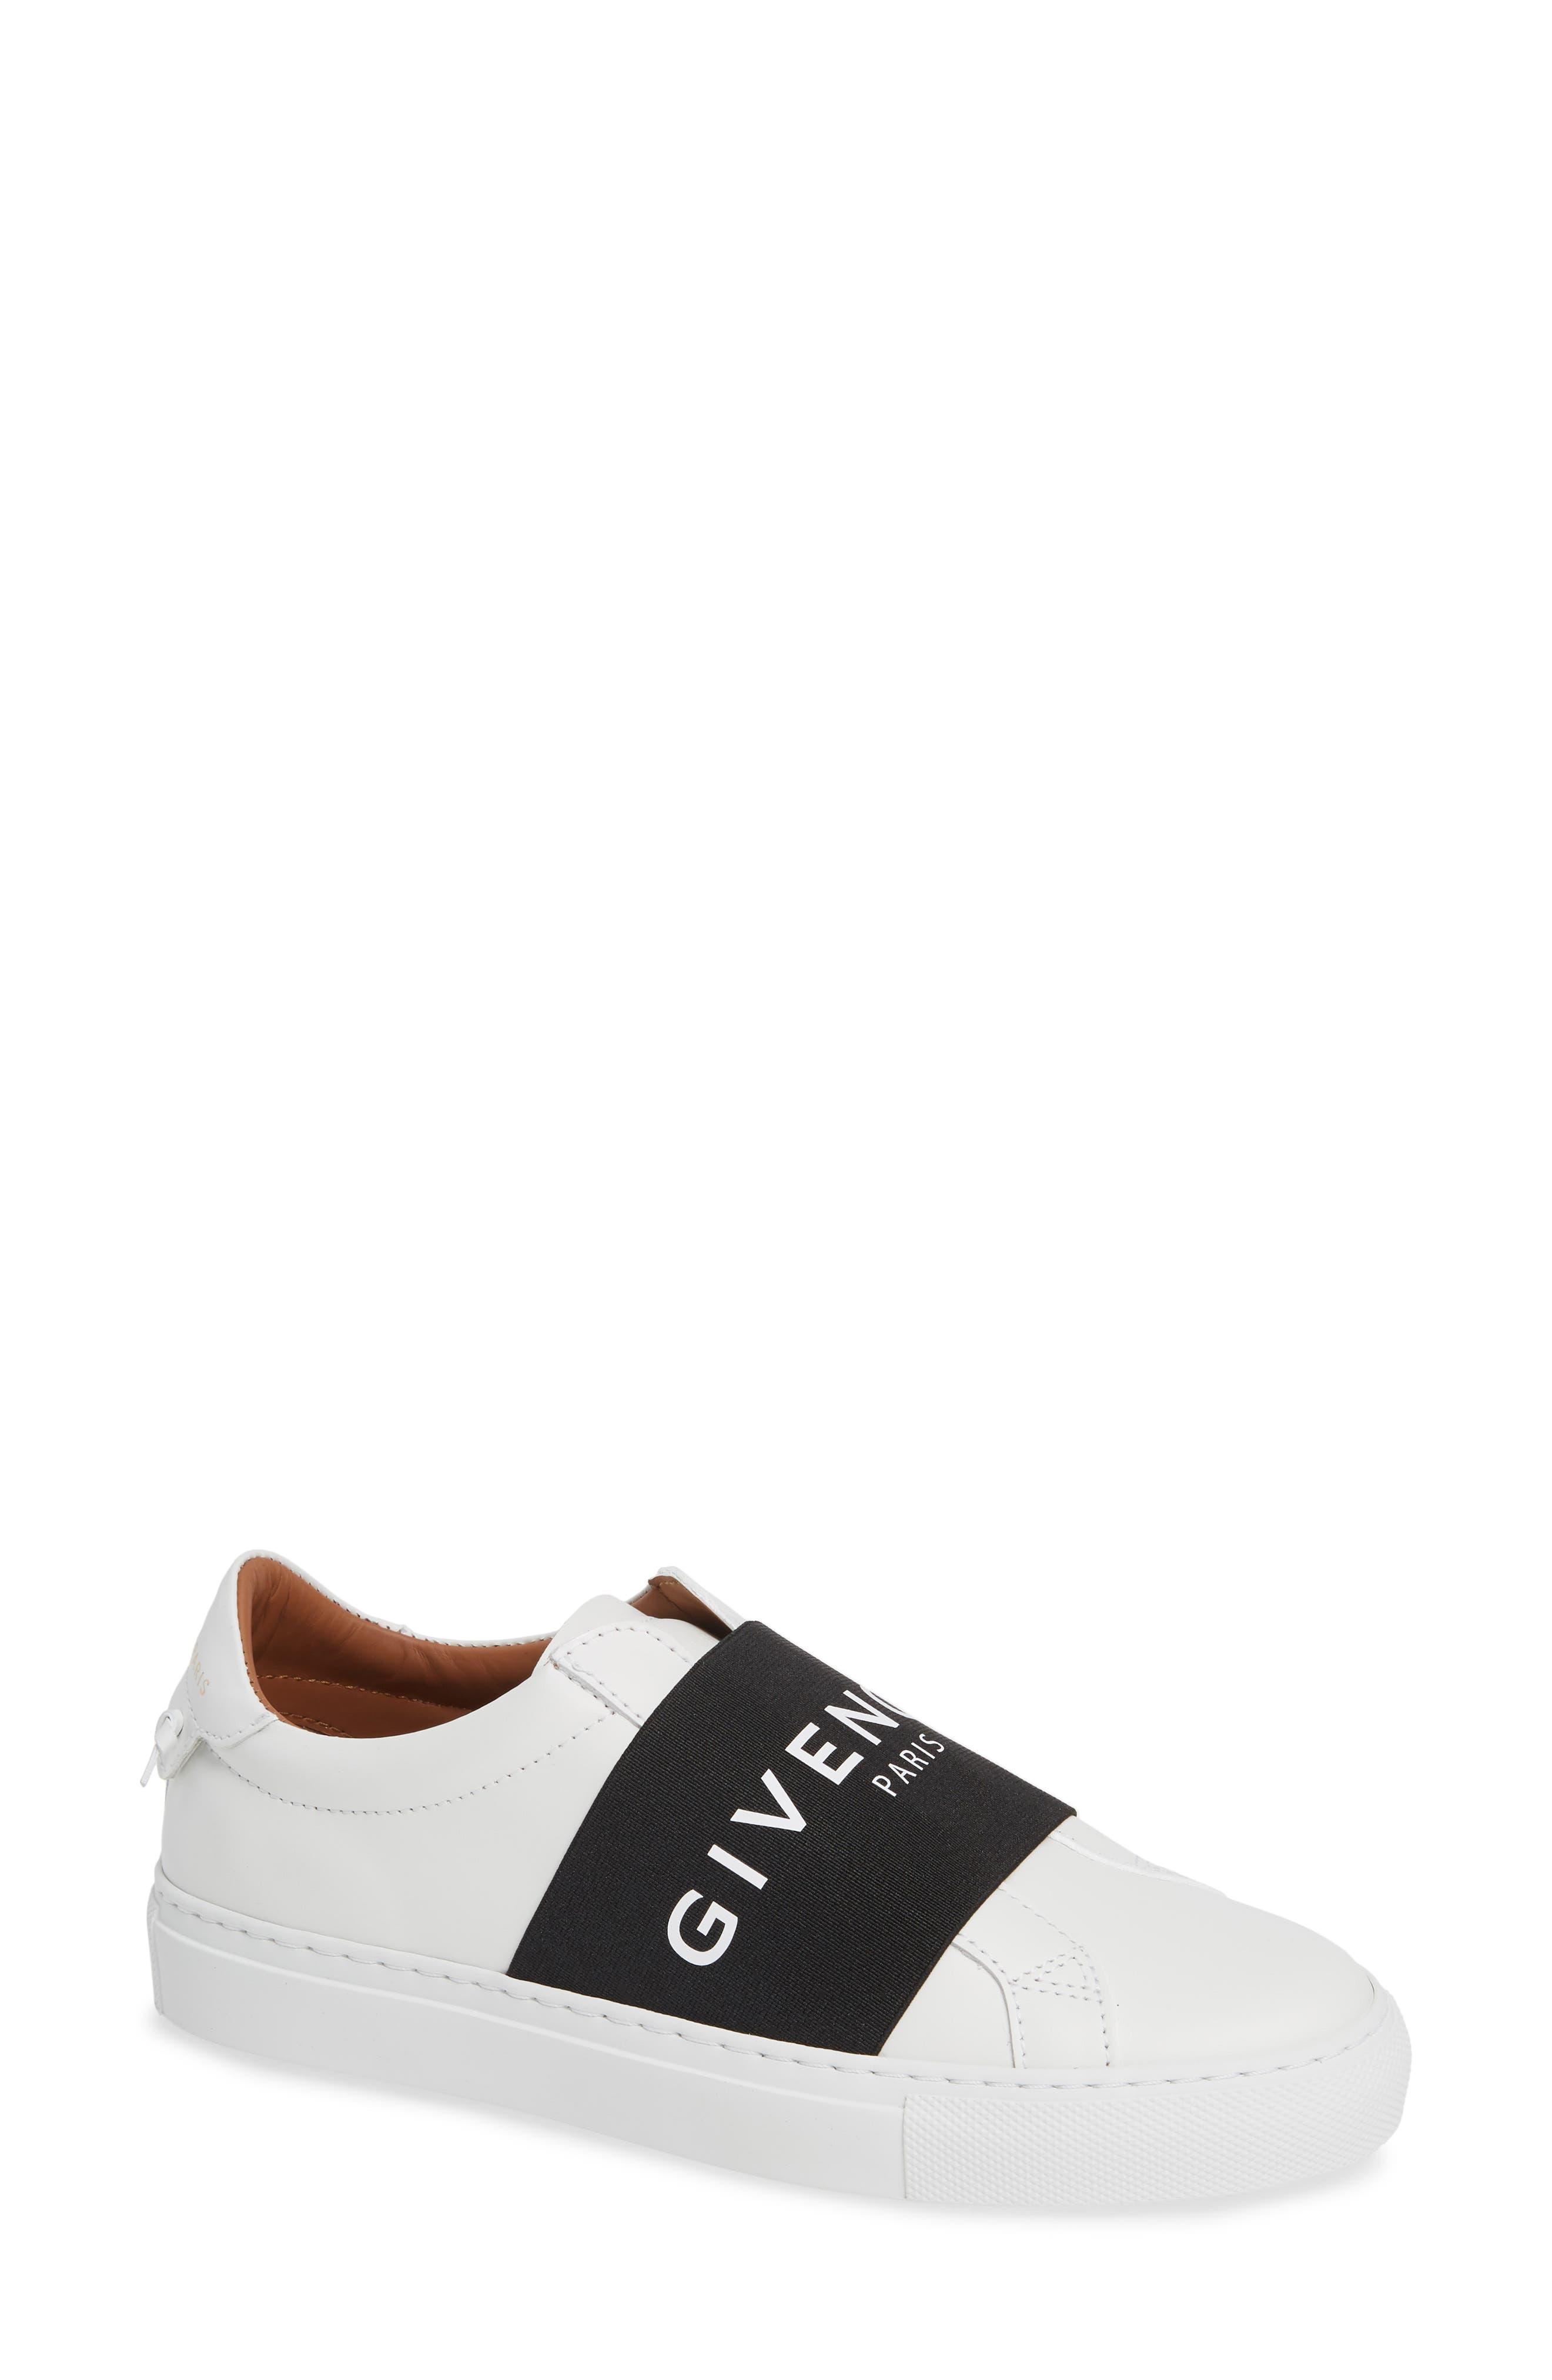 GIVENCHY Logo Strap Slip-On Sneaker, Main, color, WHITE